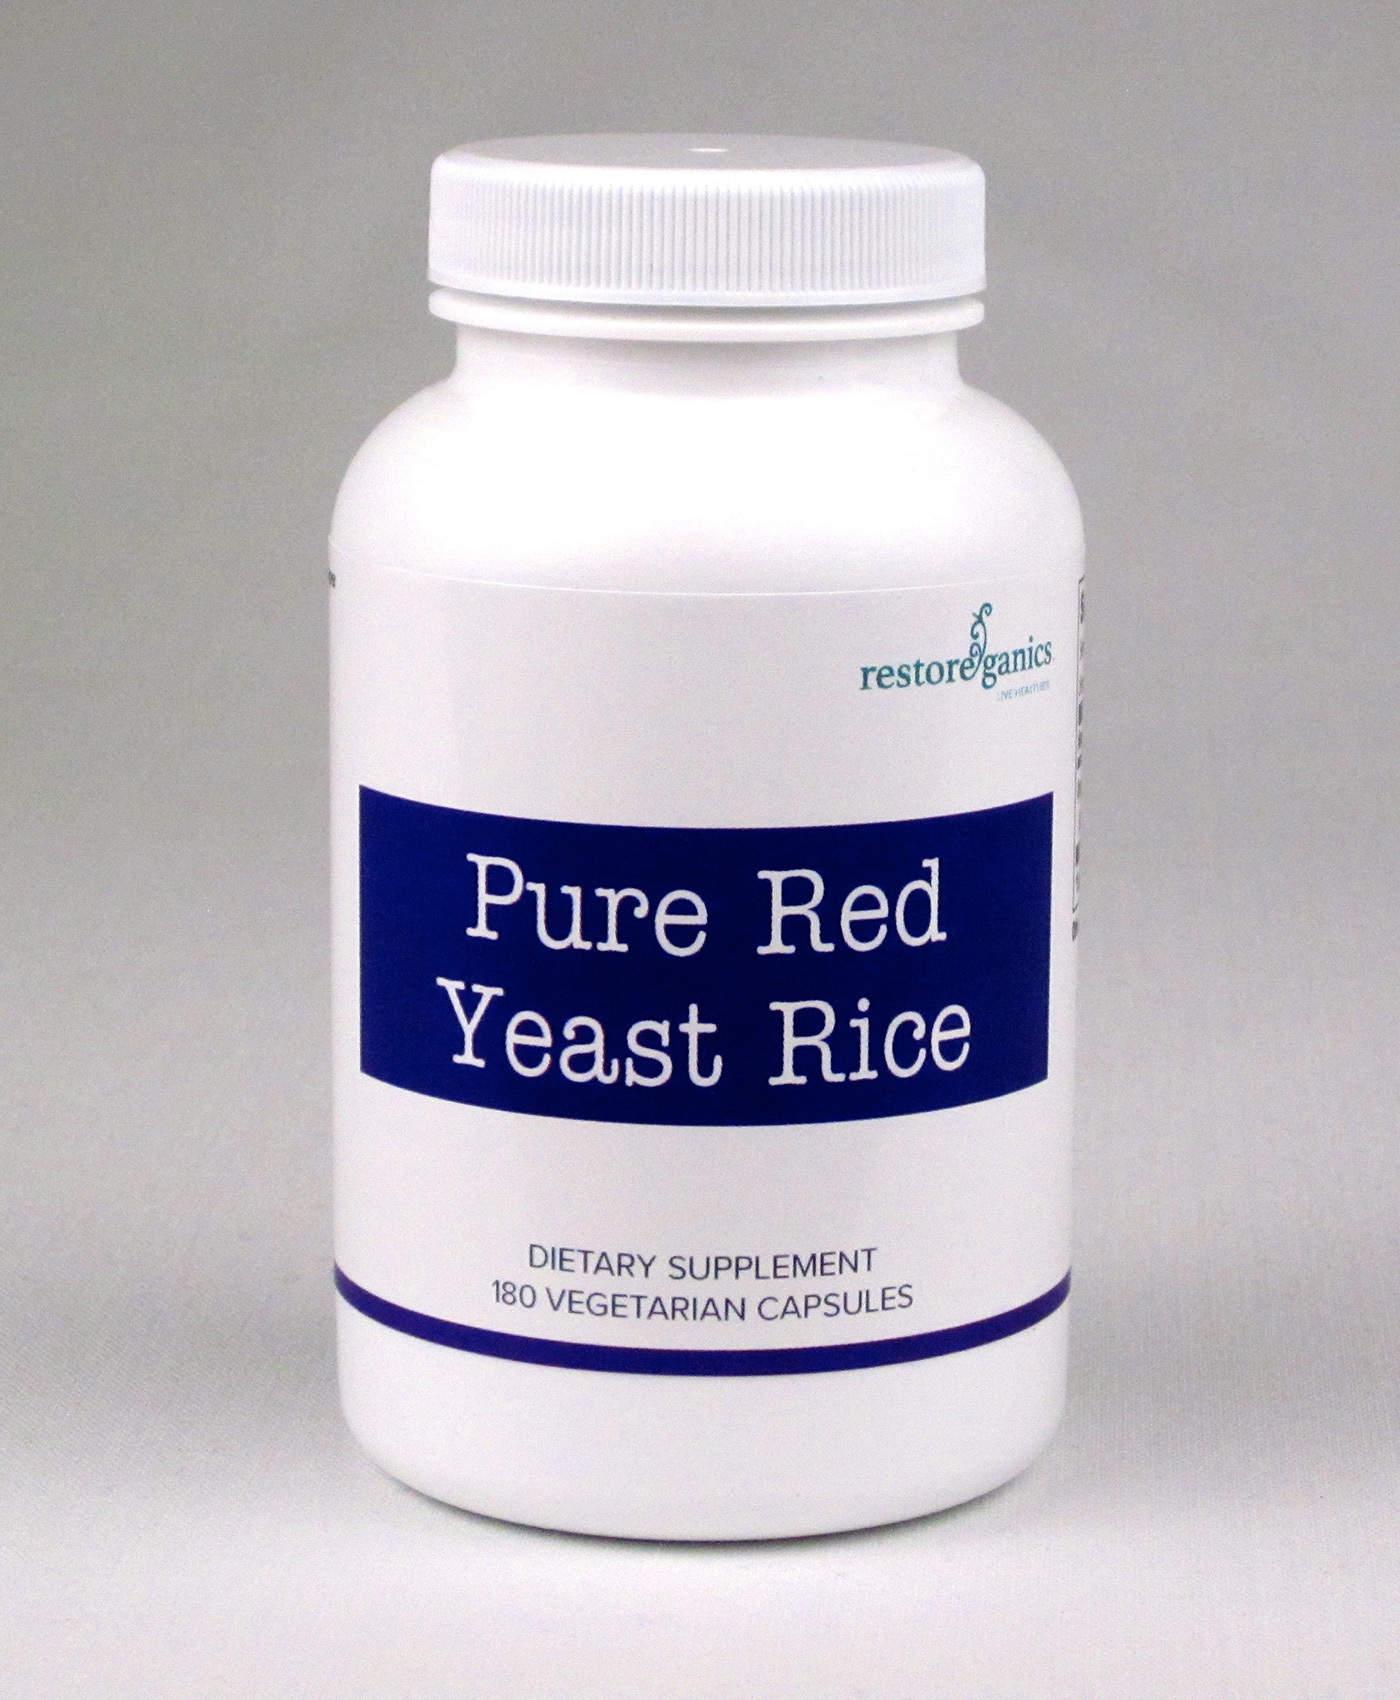 Pure Red Yeast Rice